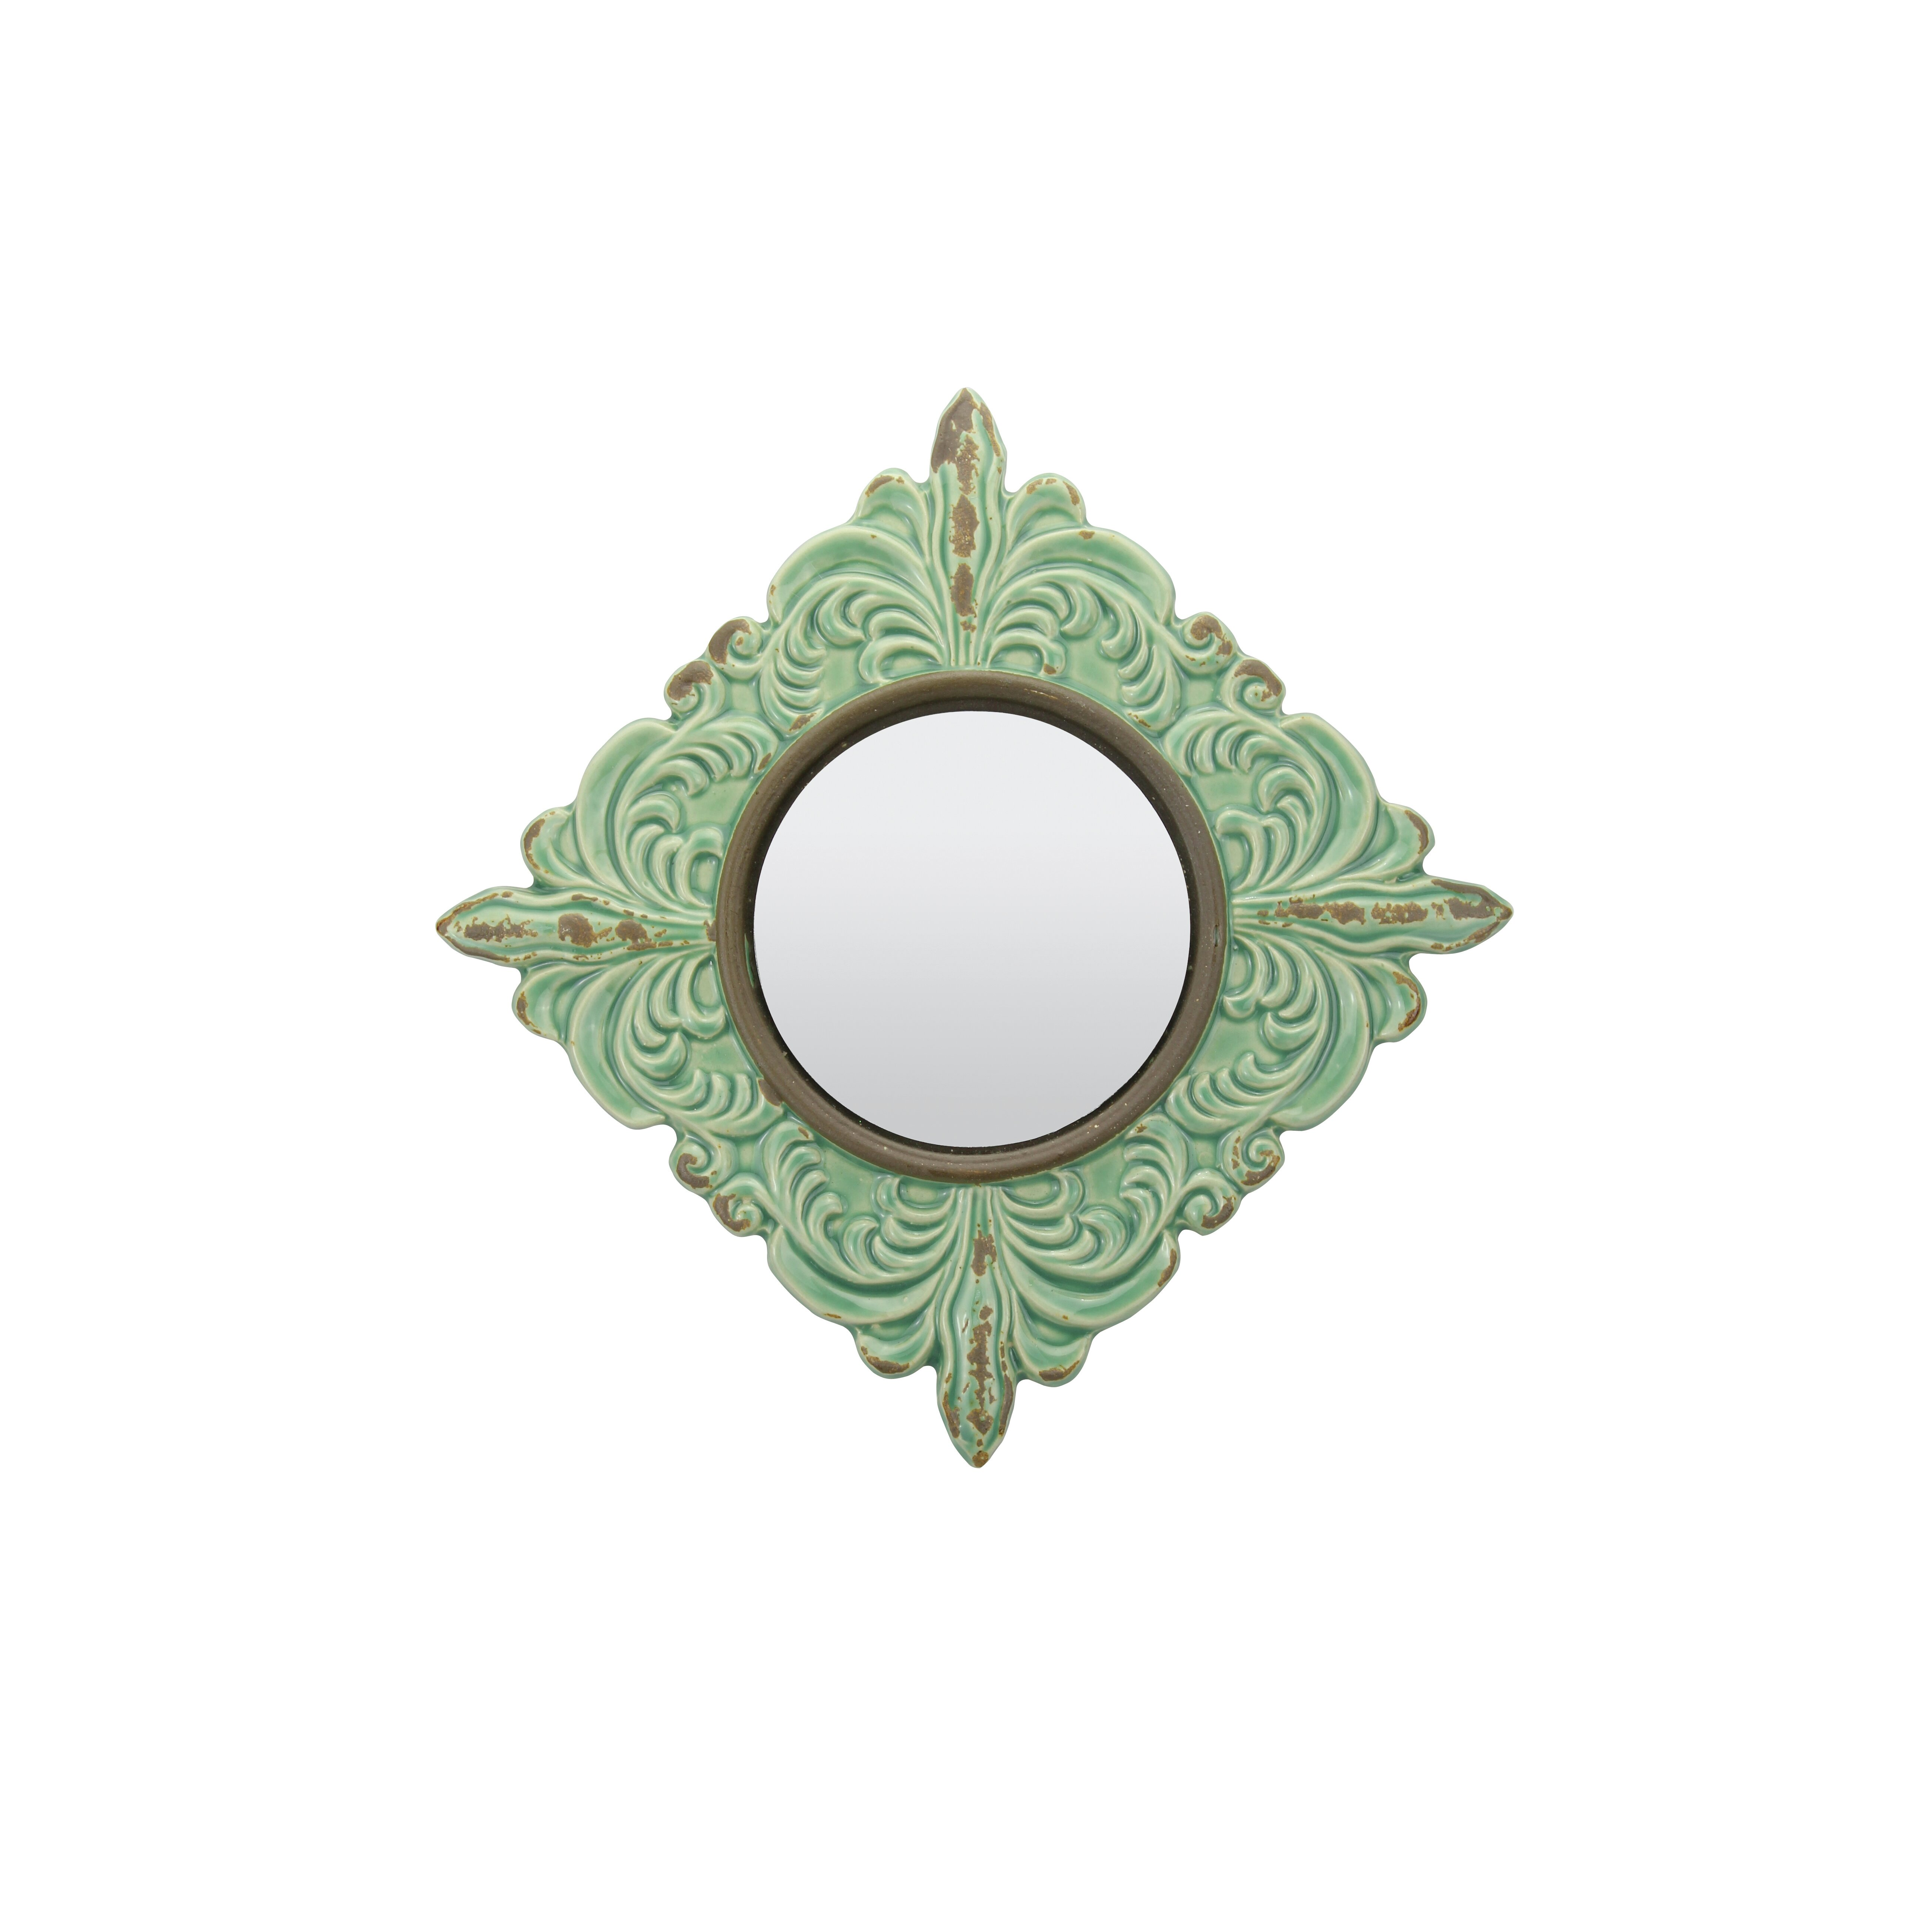 CKK Home Du00e9cor, LP Parisian Worn Ceramic Distressed Wall Mirror in Turquoise u0026 Reviews : Wayfair.ca